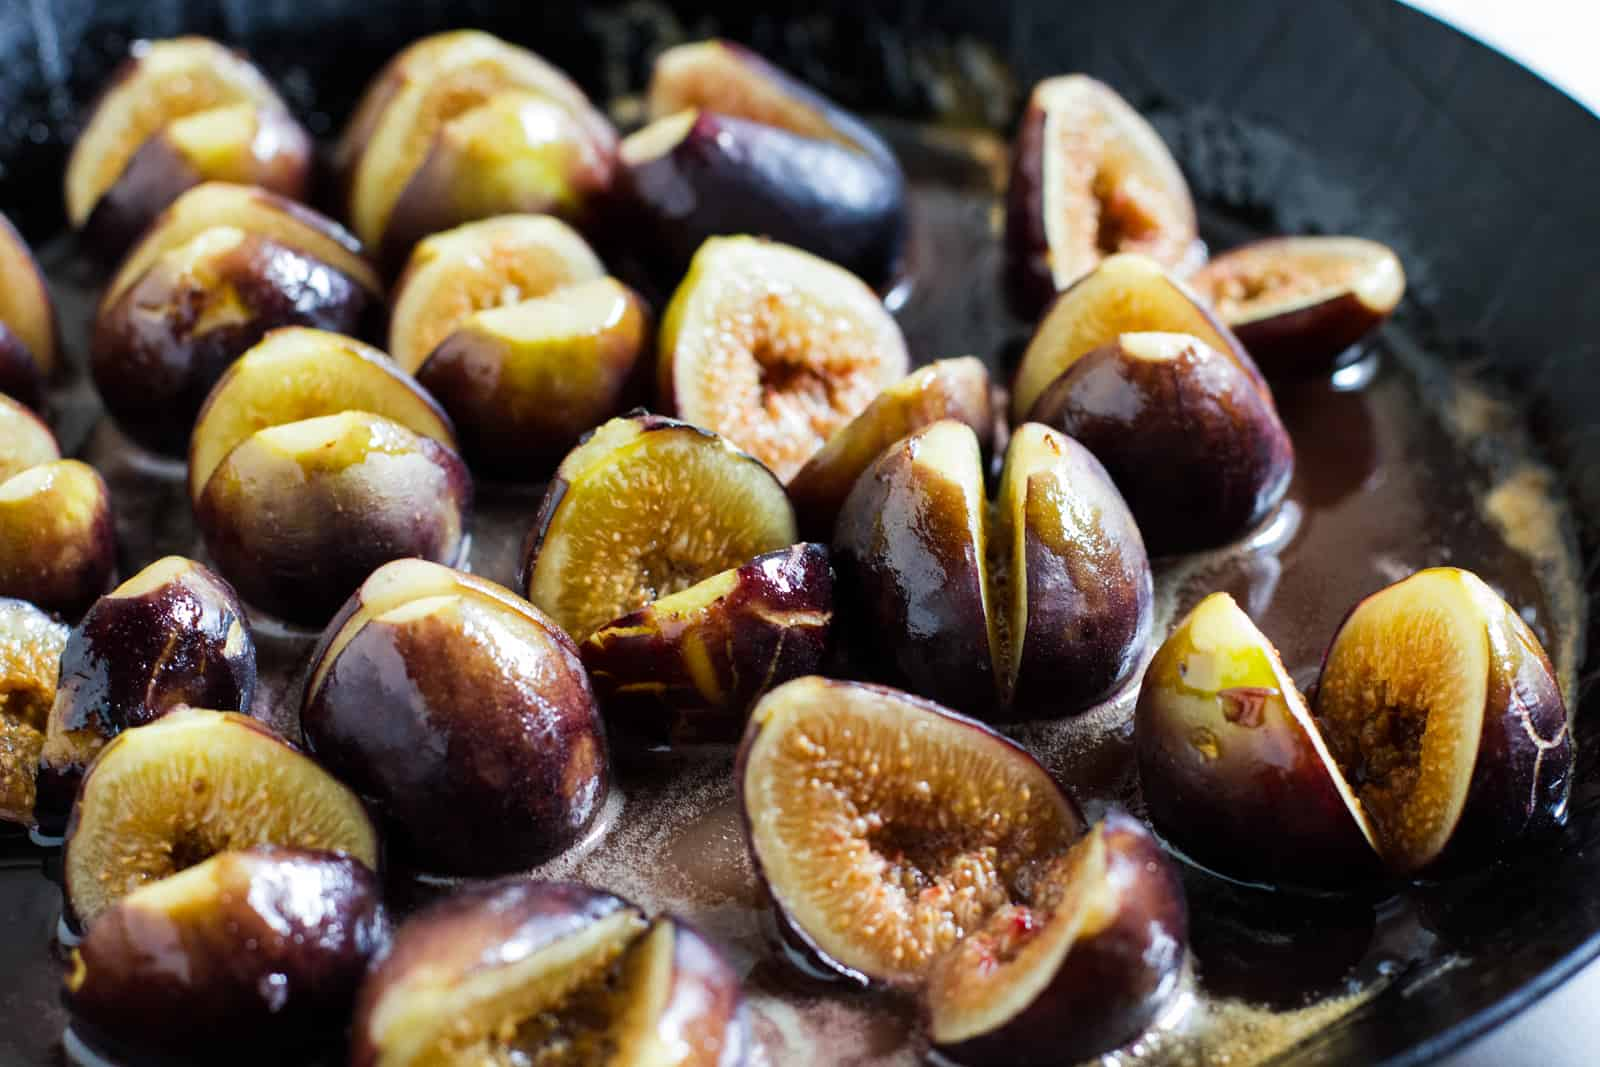 Skillet of honey figs